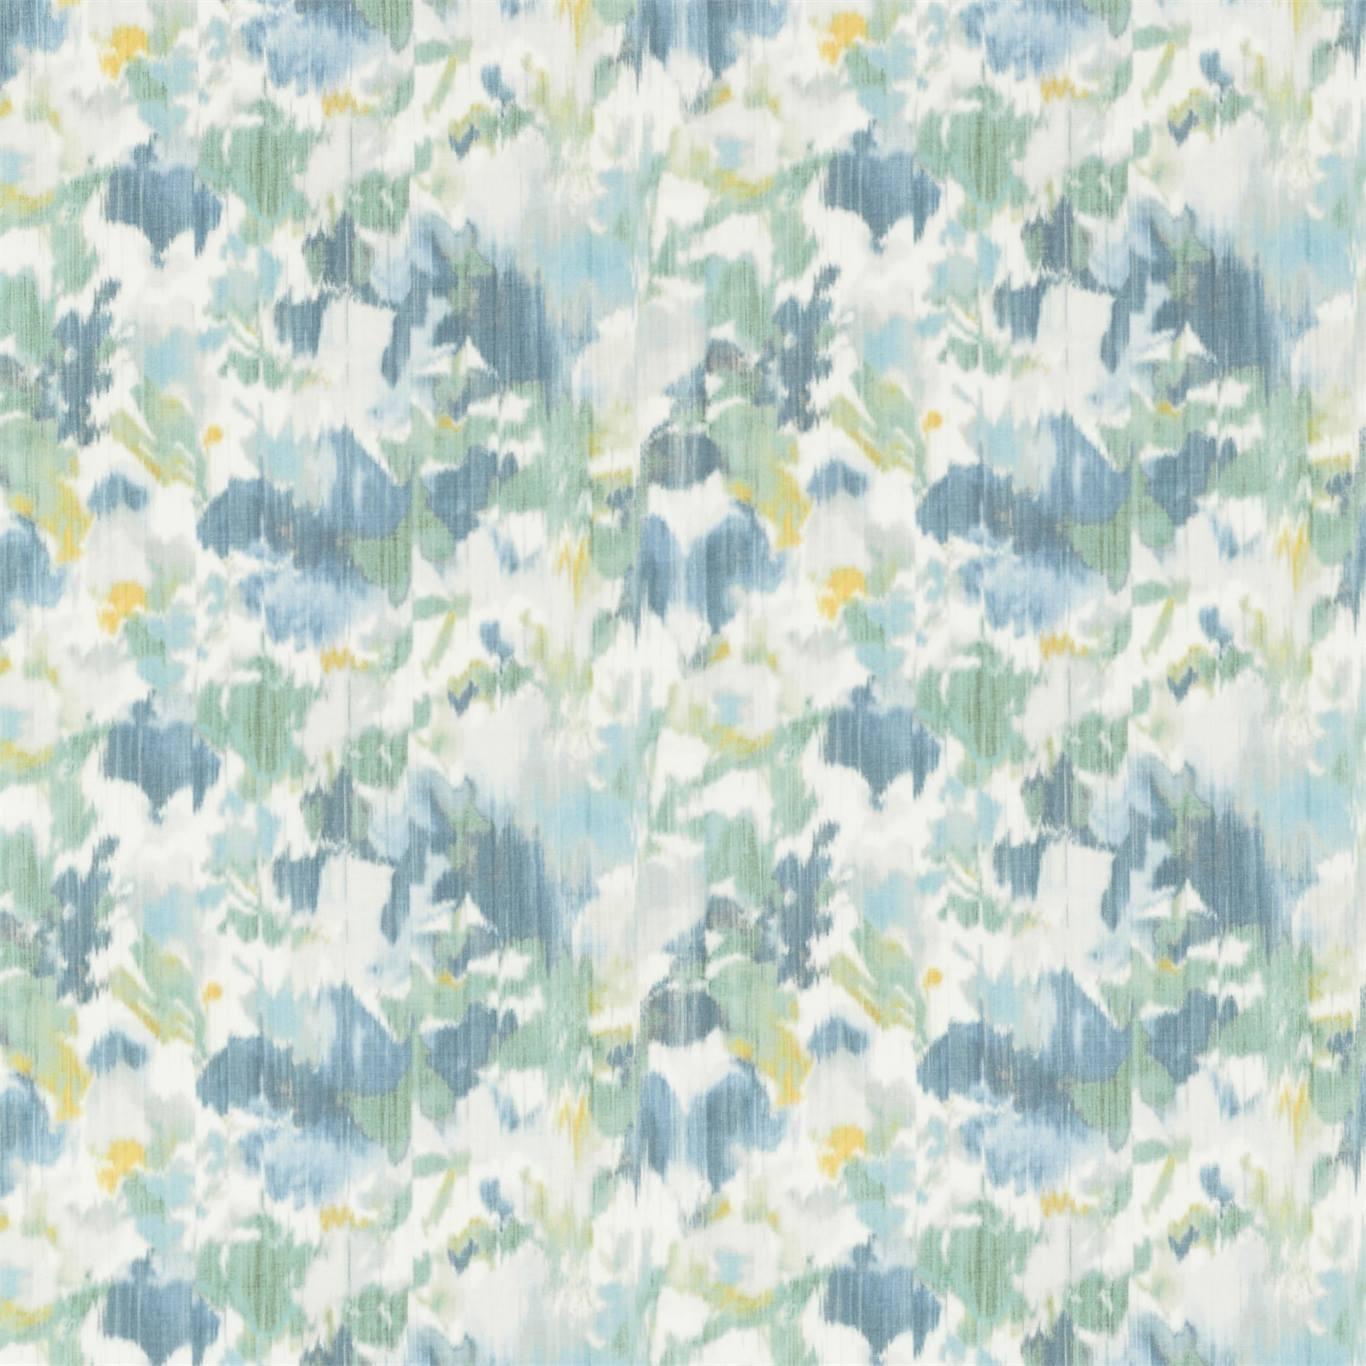 Image of Sanderson Poet's Garden Teal/Indigo Fabric 226756